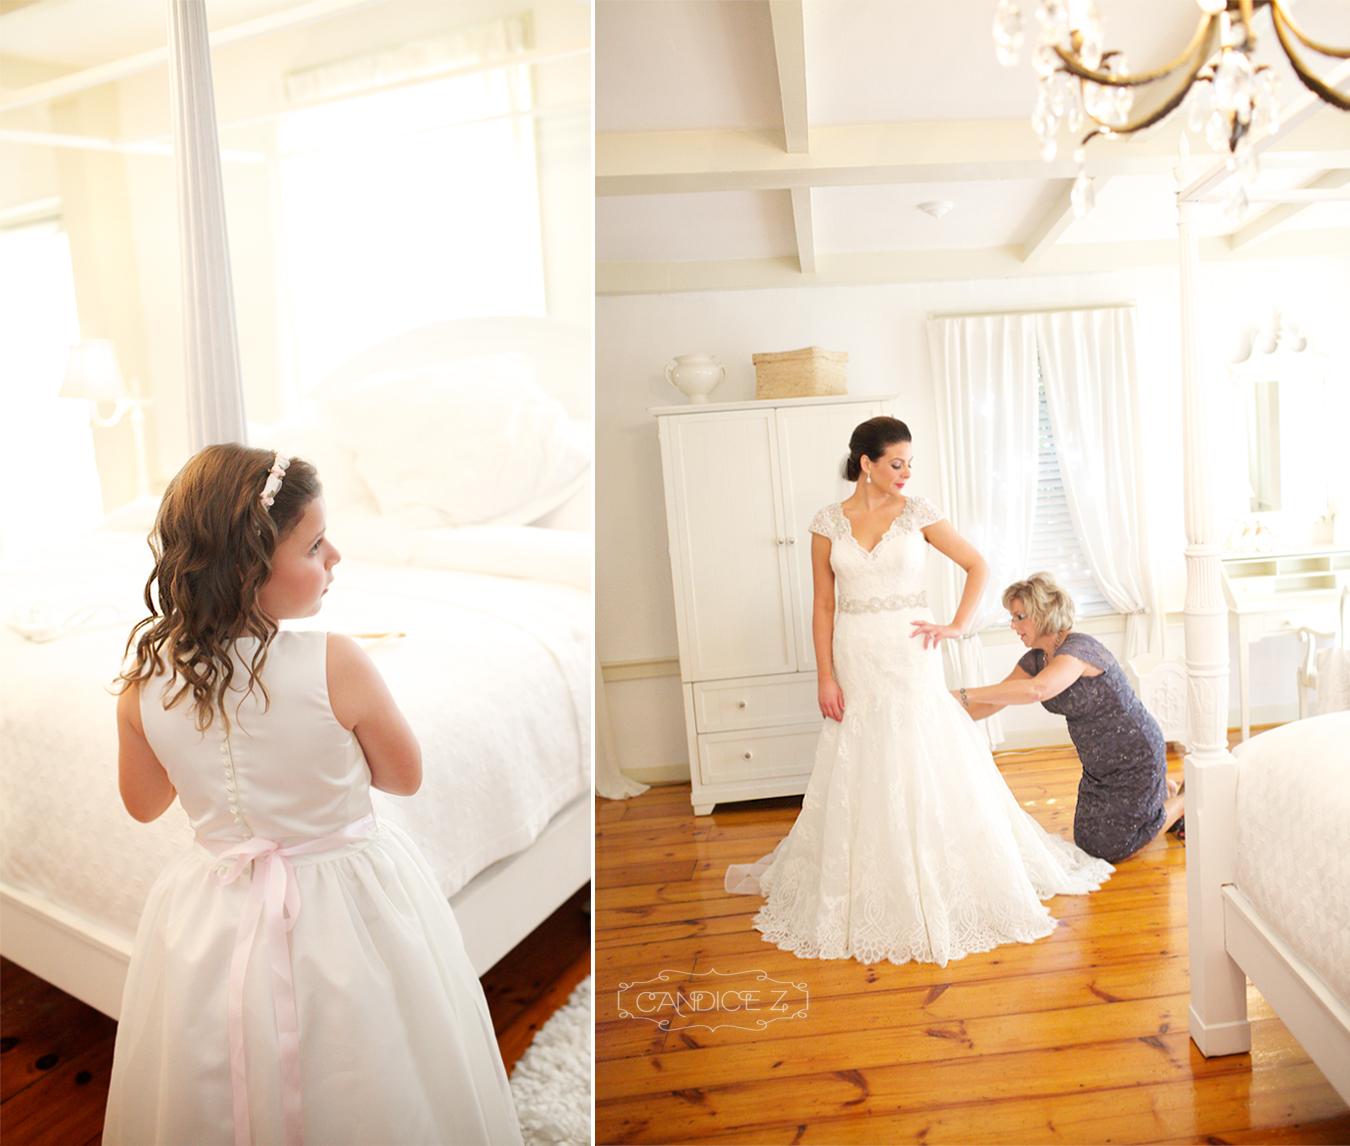 Cottage_House_Wedding_Get_Ready_2 copy.jpg